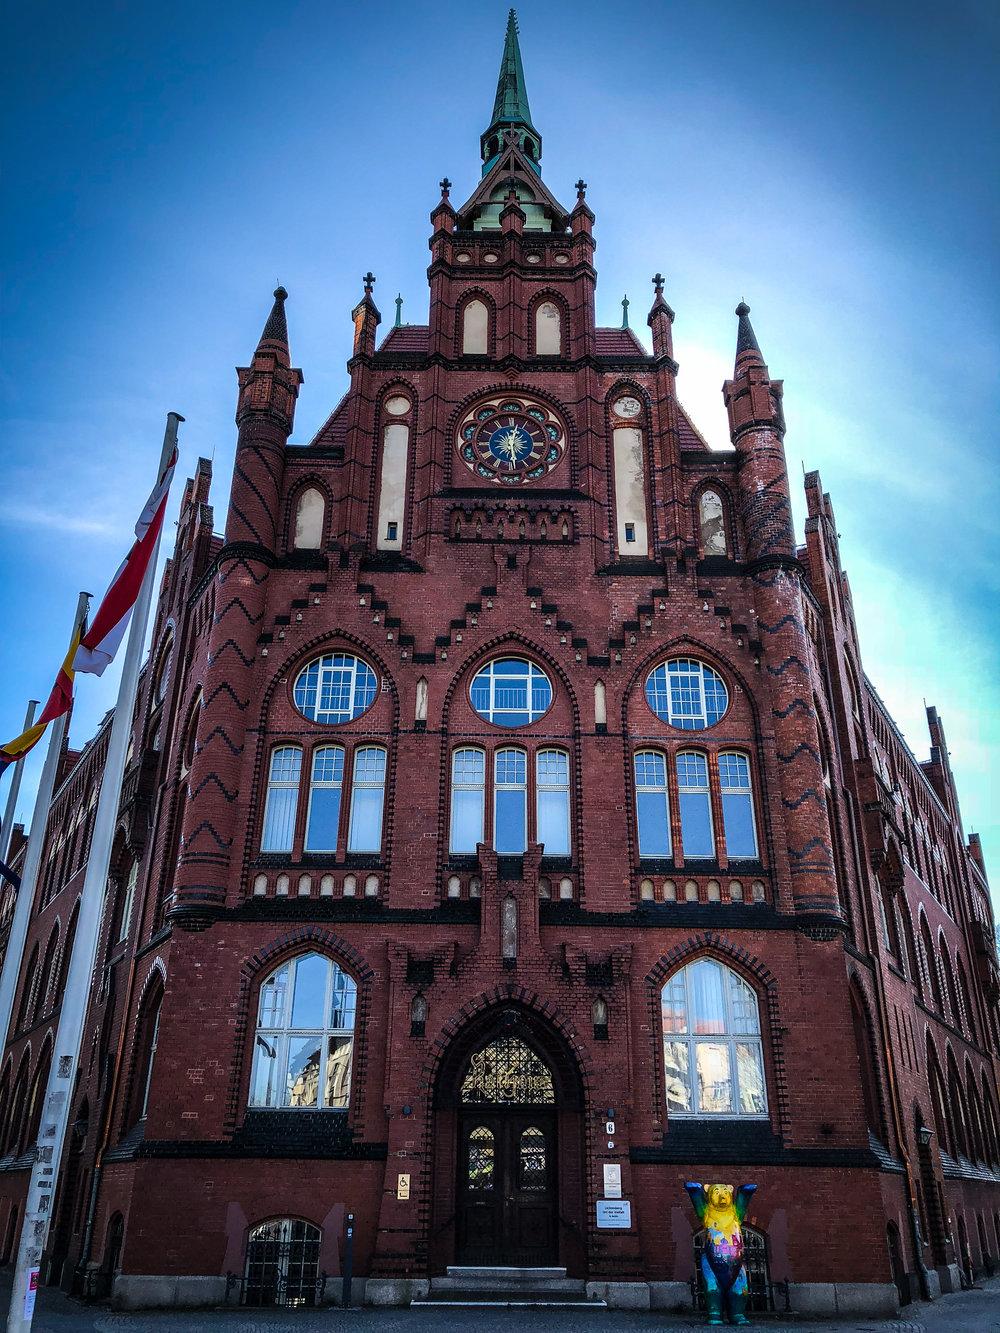 Rathaus, Lichtenberg administrative building built in 1890